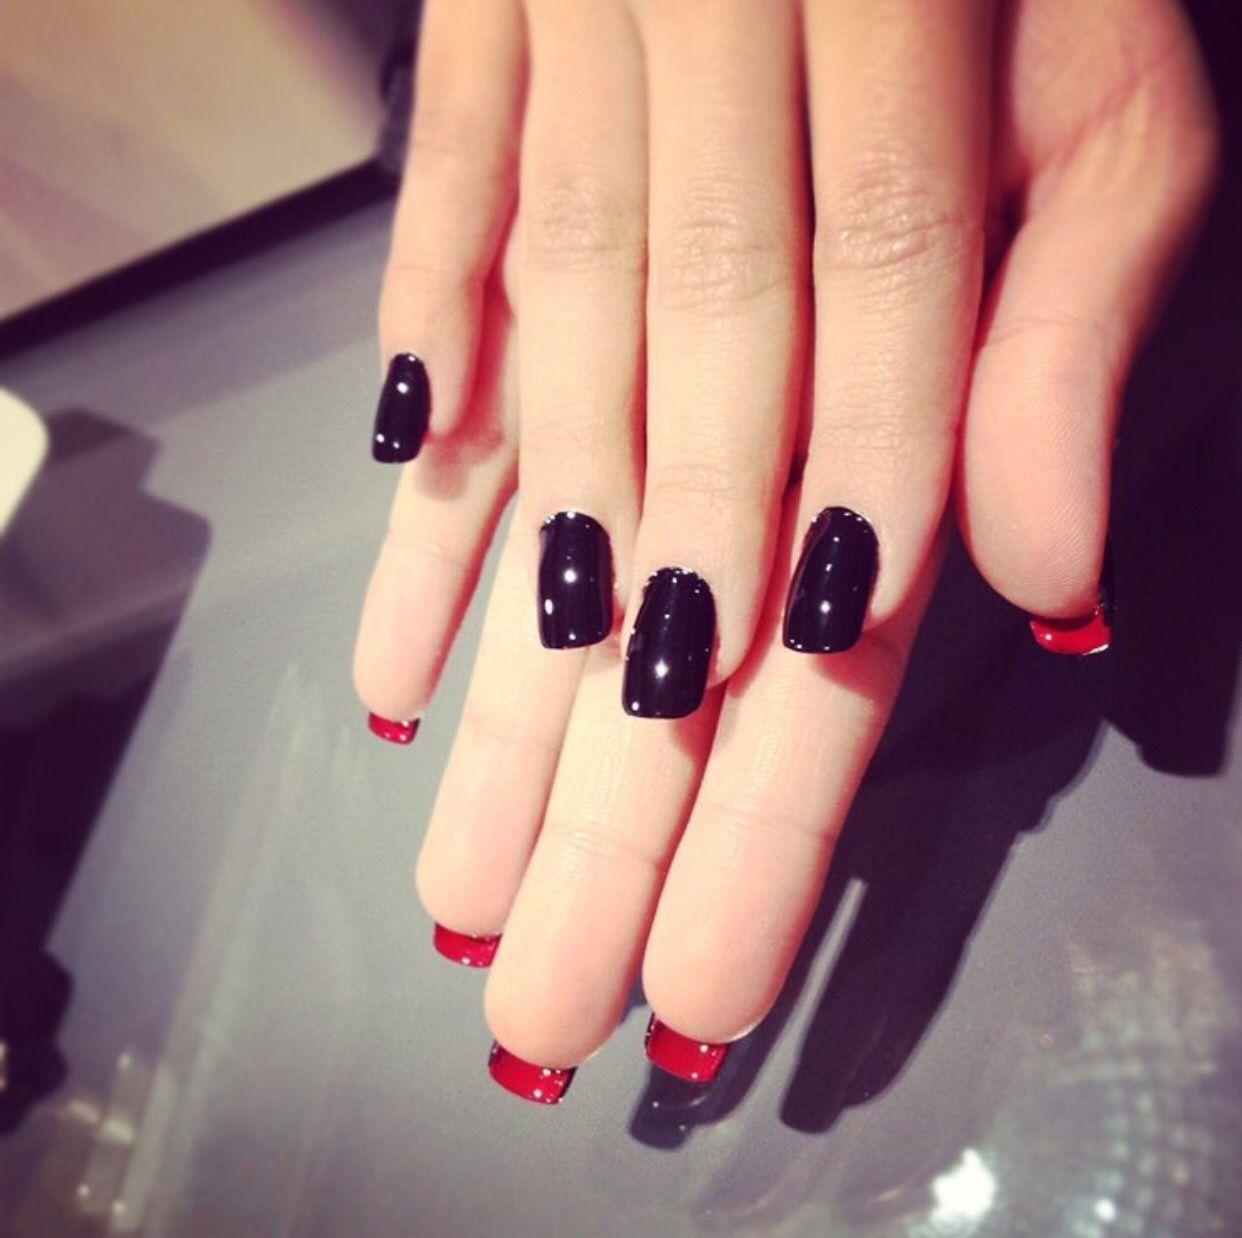 Louboutin inspired nails!! | Nails by Midori | Pinterest